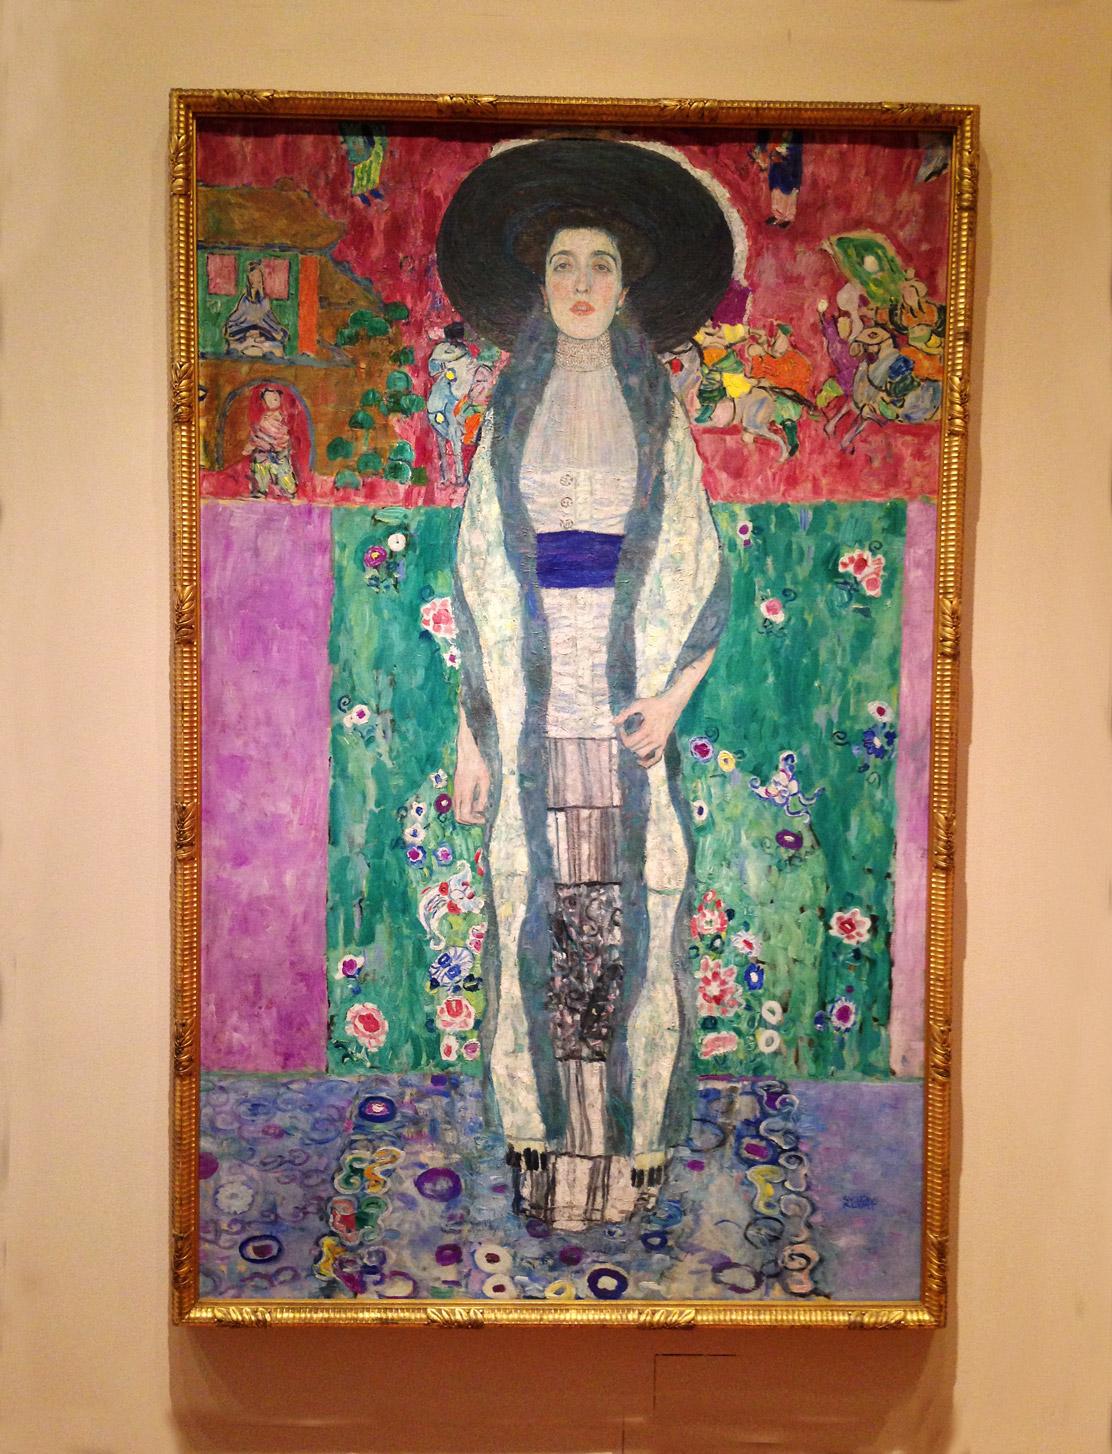 I love the colors in this Klimt portrait.